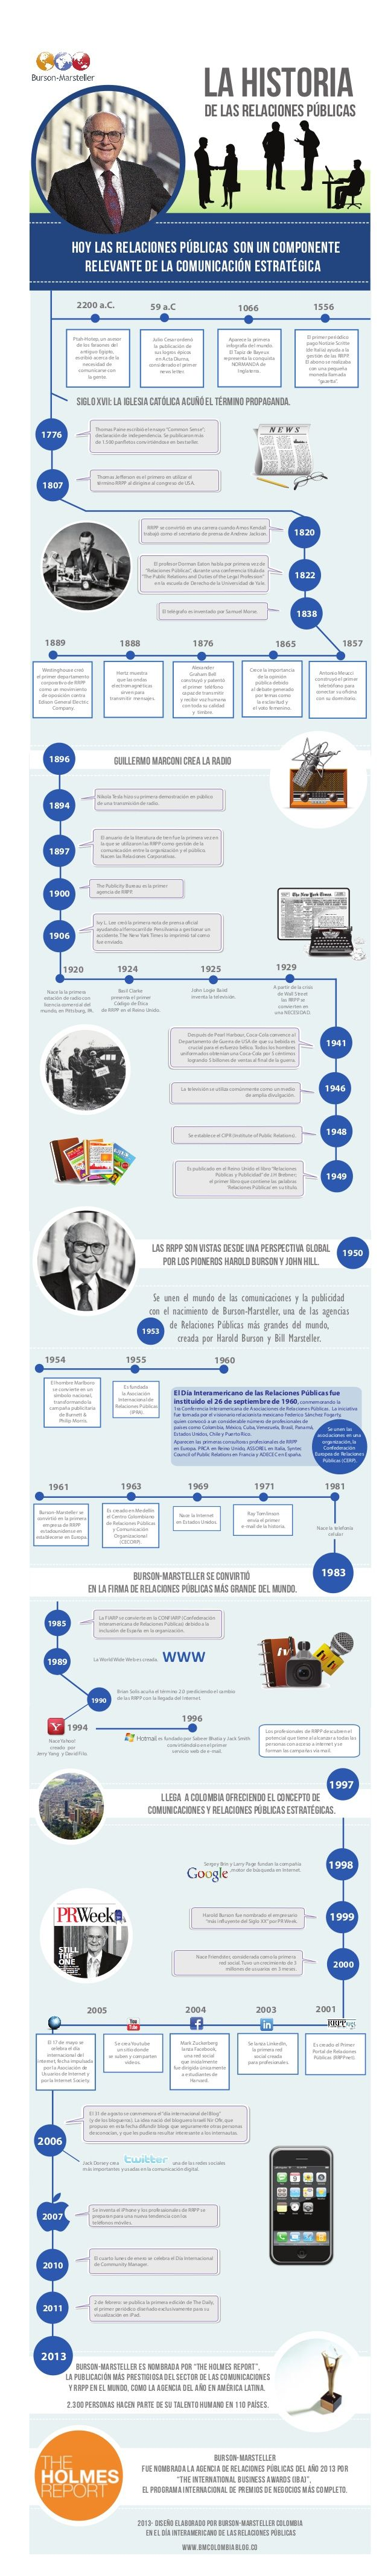 Historia de las Relaciones Públicas - http://kcy.me/u6pa http://www.onkreativ.com/